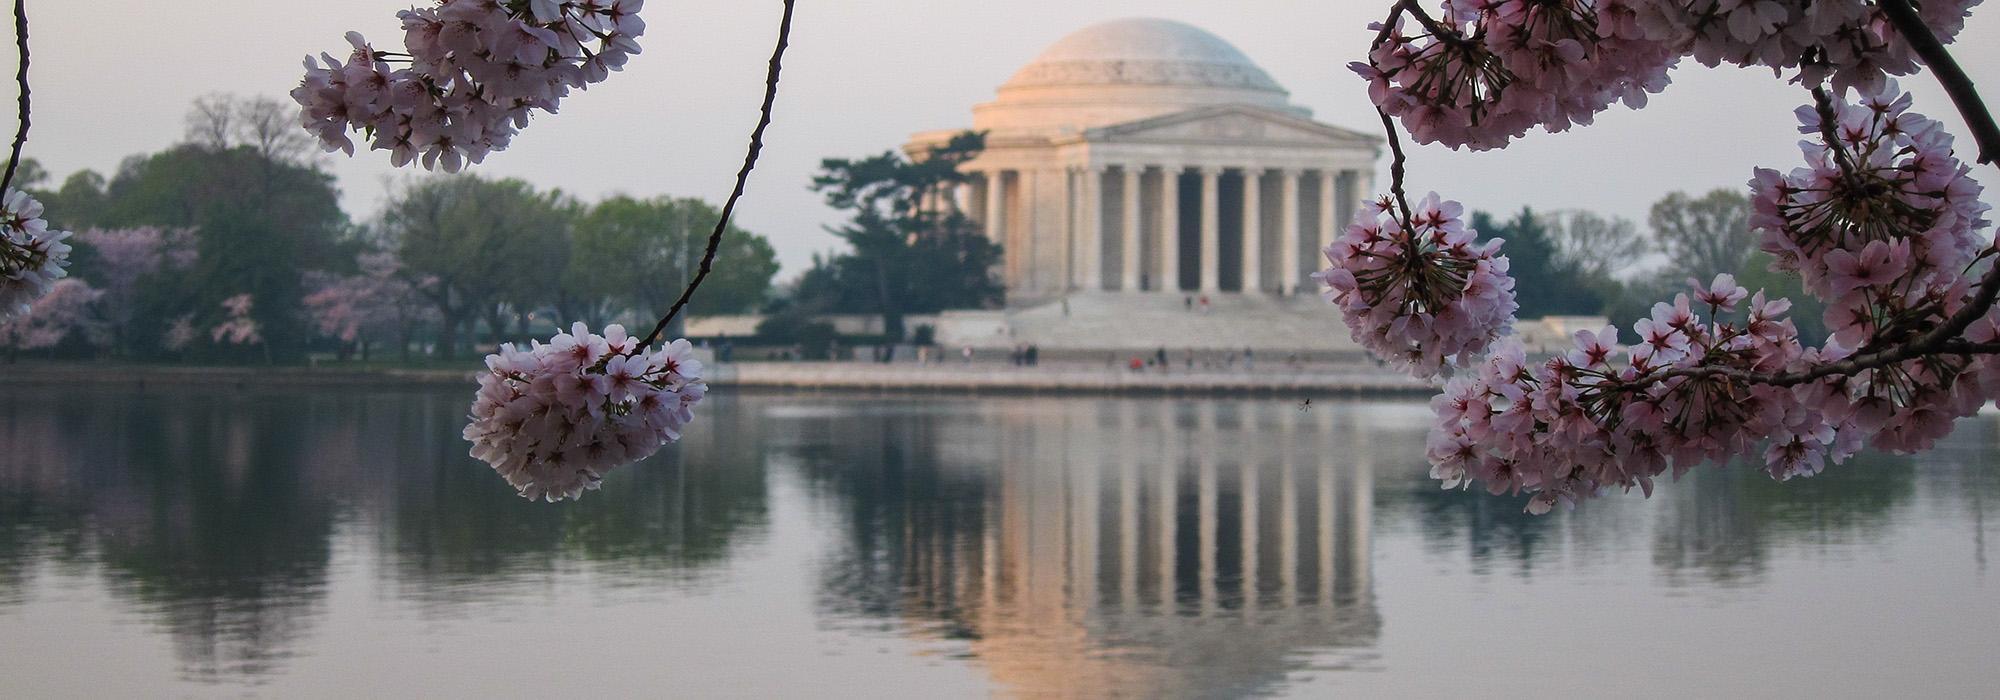 NationalMall_hero_CherryBlossoms_CharlesBirnbaum_2012.jpg